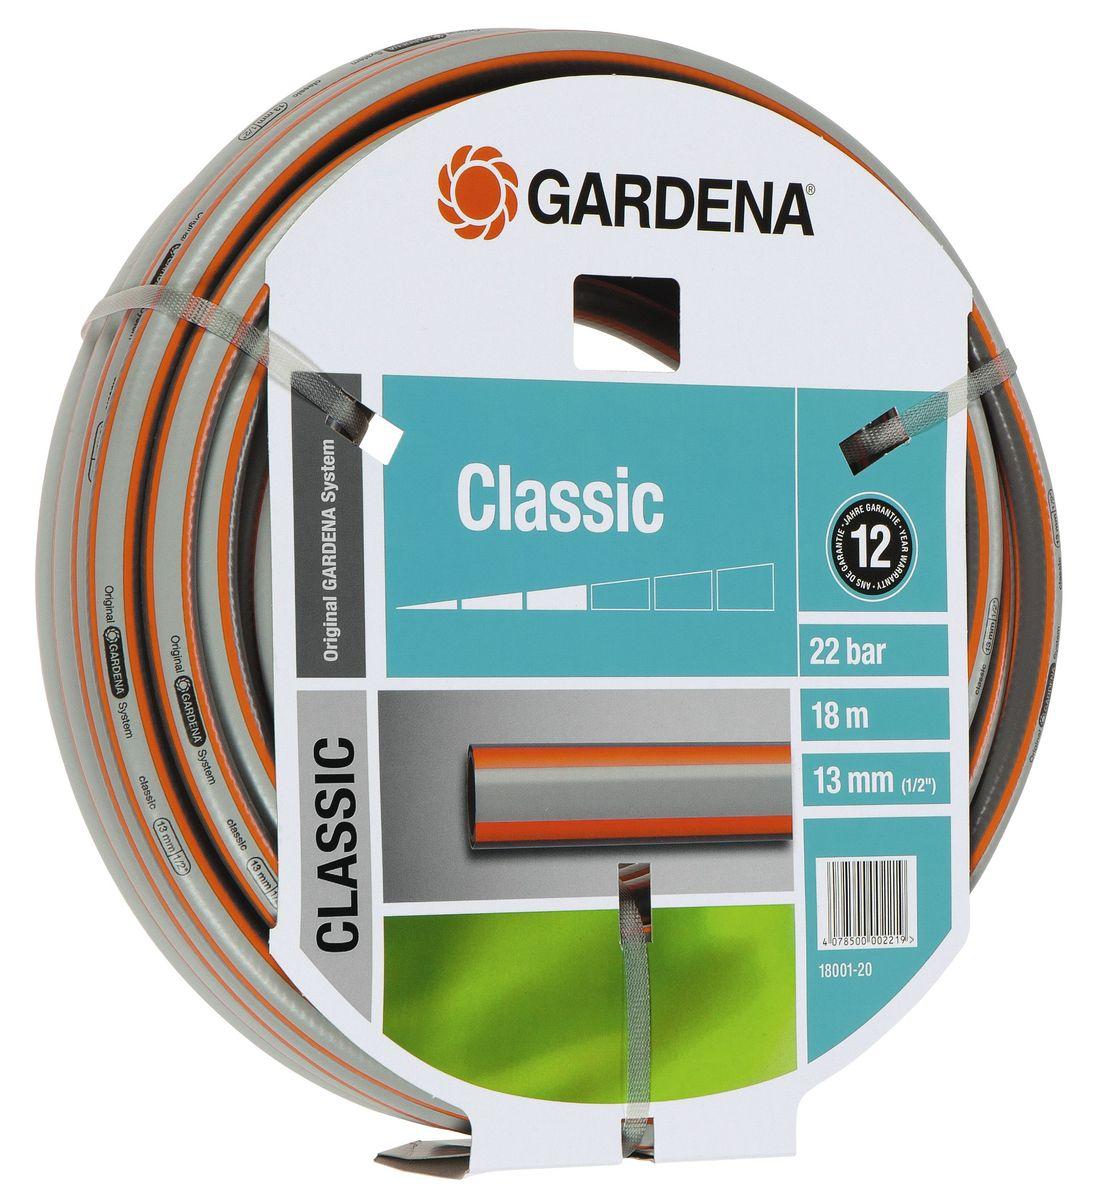 Шланг Gardena Classic, 13 мм (1/2) х 18 м шланг gardena сочащийся для наземной прокладки 13 мм 1 2 х 50 м с фитингами 13013 20 000 00